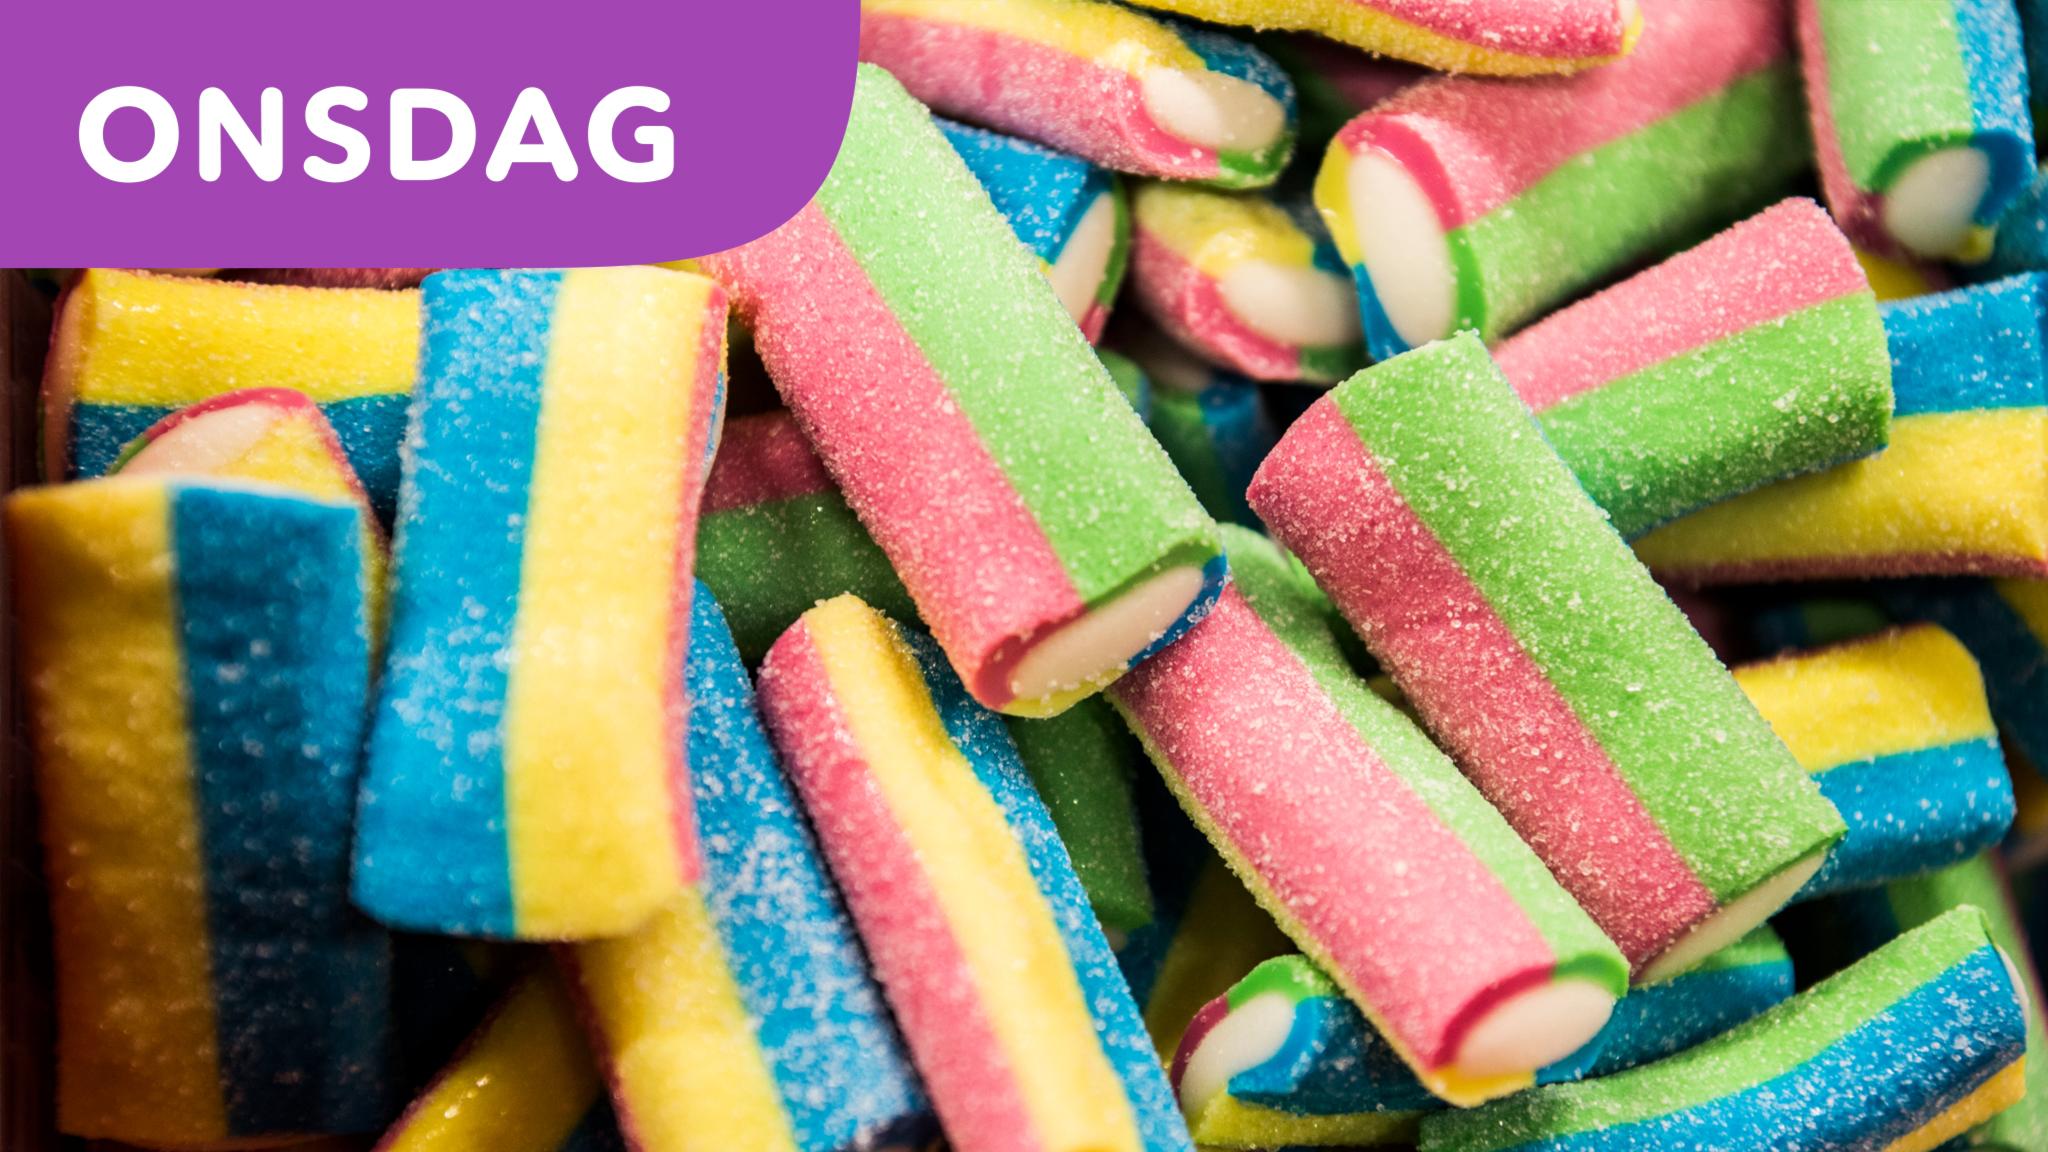 100 ton fejkat godis upptäckt i Malmö